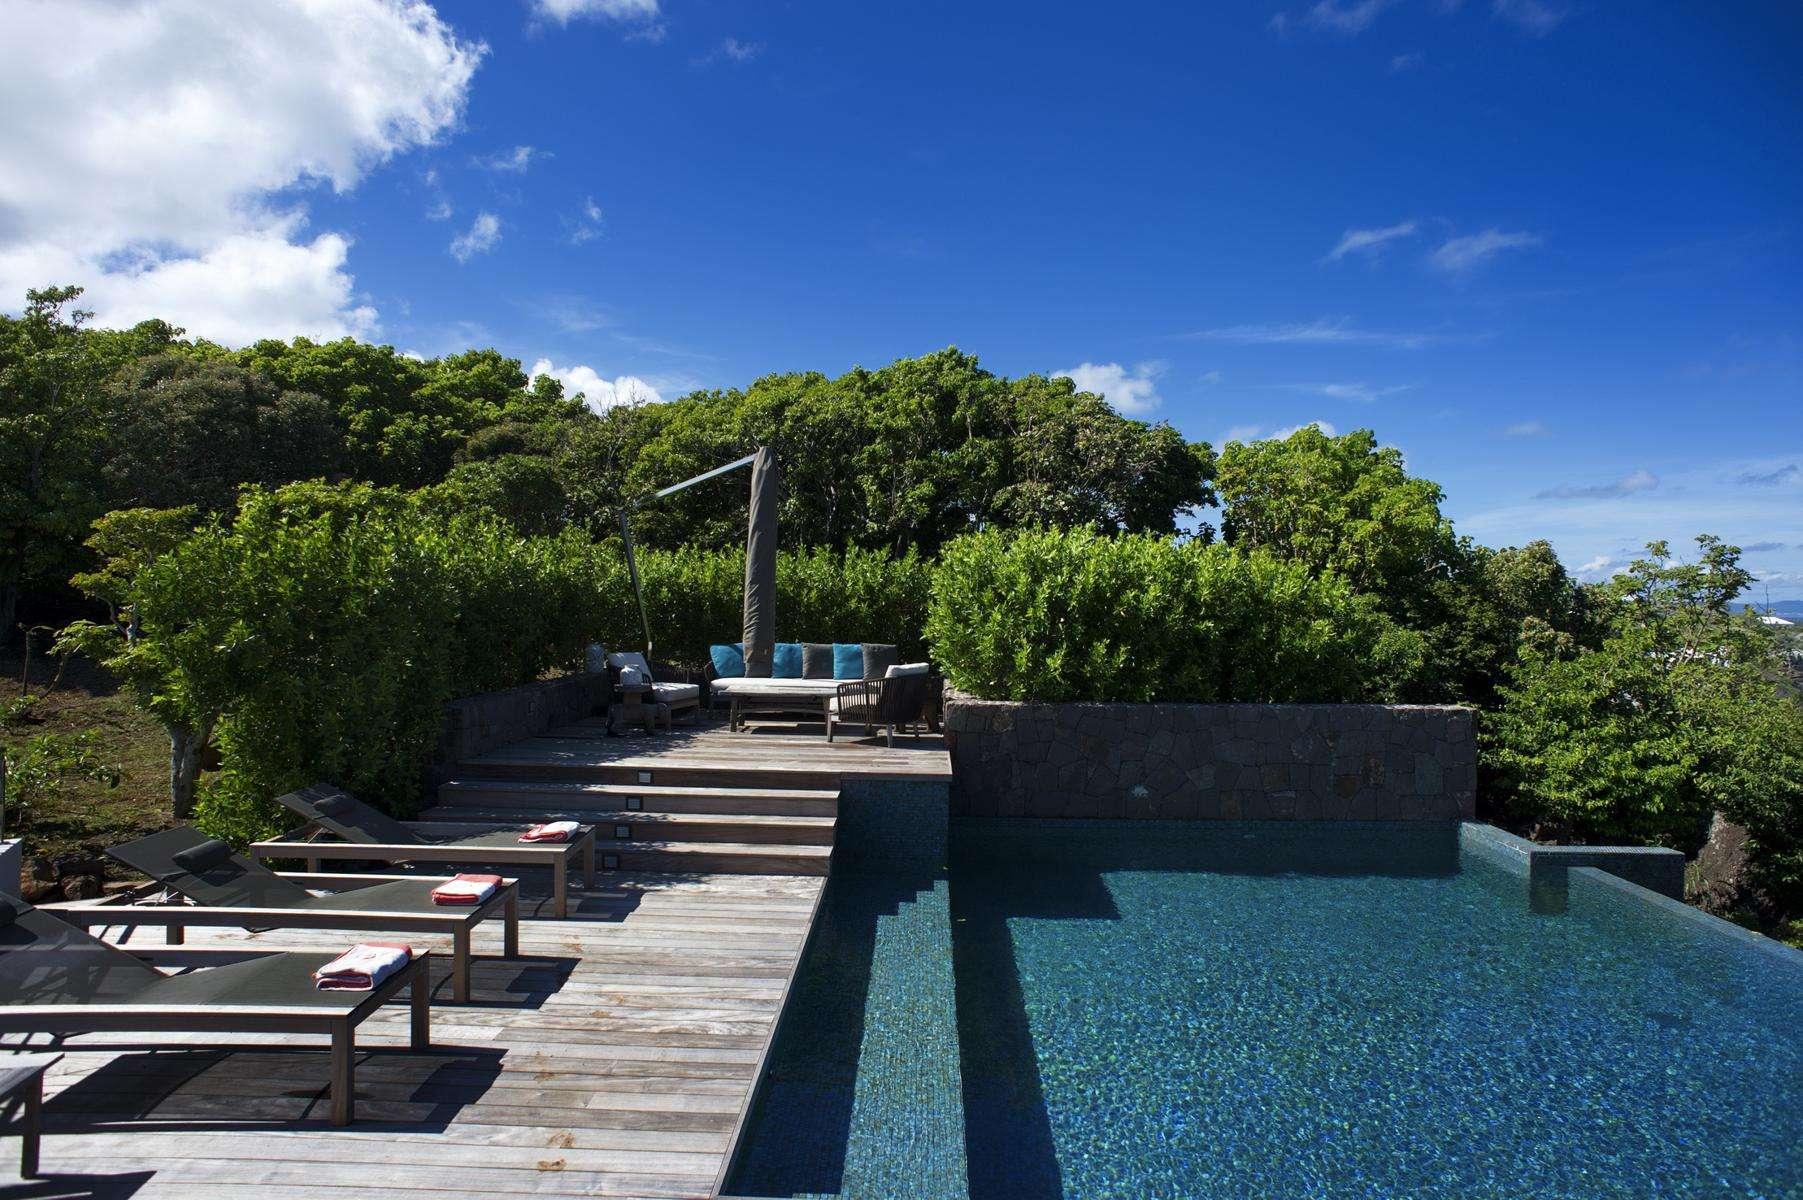 Luxury villa rentals caribbean - St barthelemy - Mont jean - No location 4 - Turtle - Image 1/35